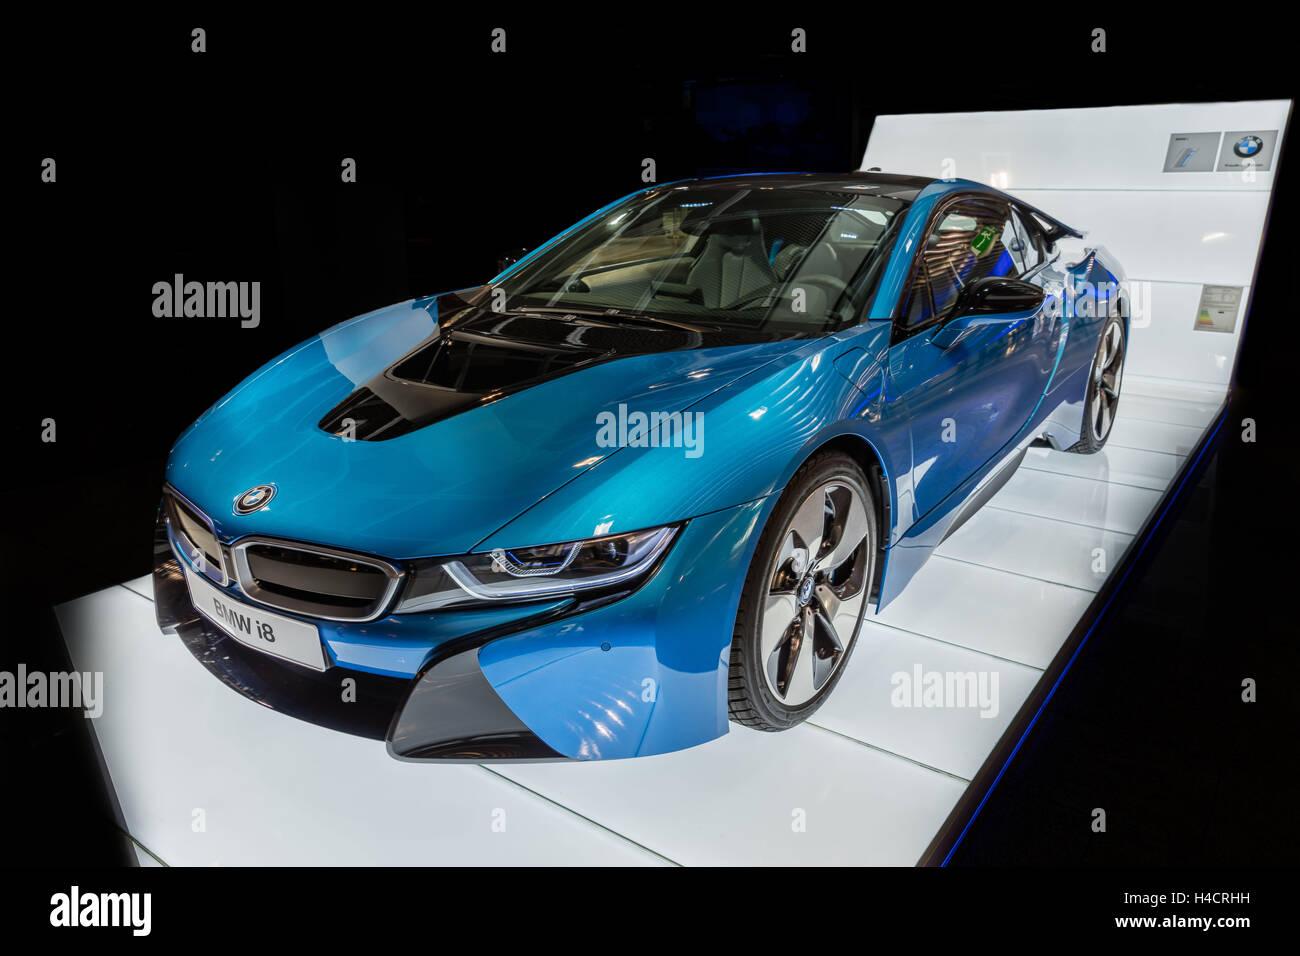 Bmw i8 hybrid vehicle otto engine electric motor for Hybrid car electric motor